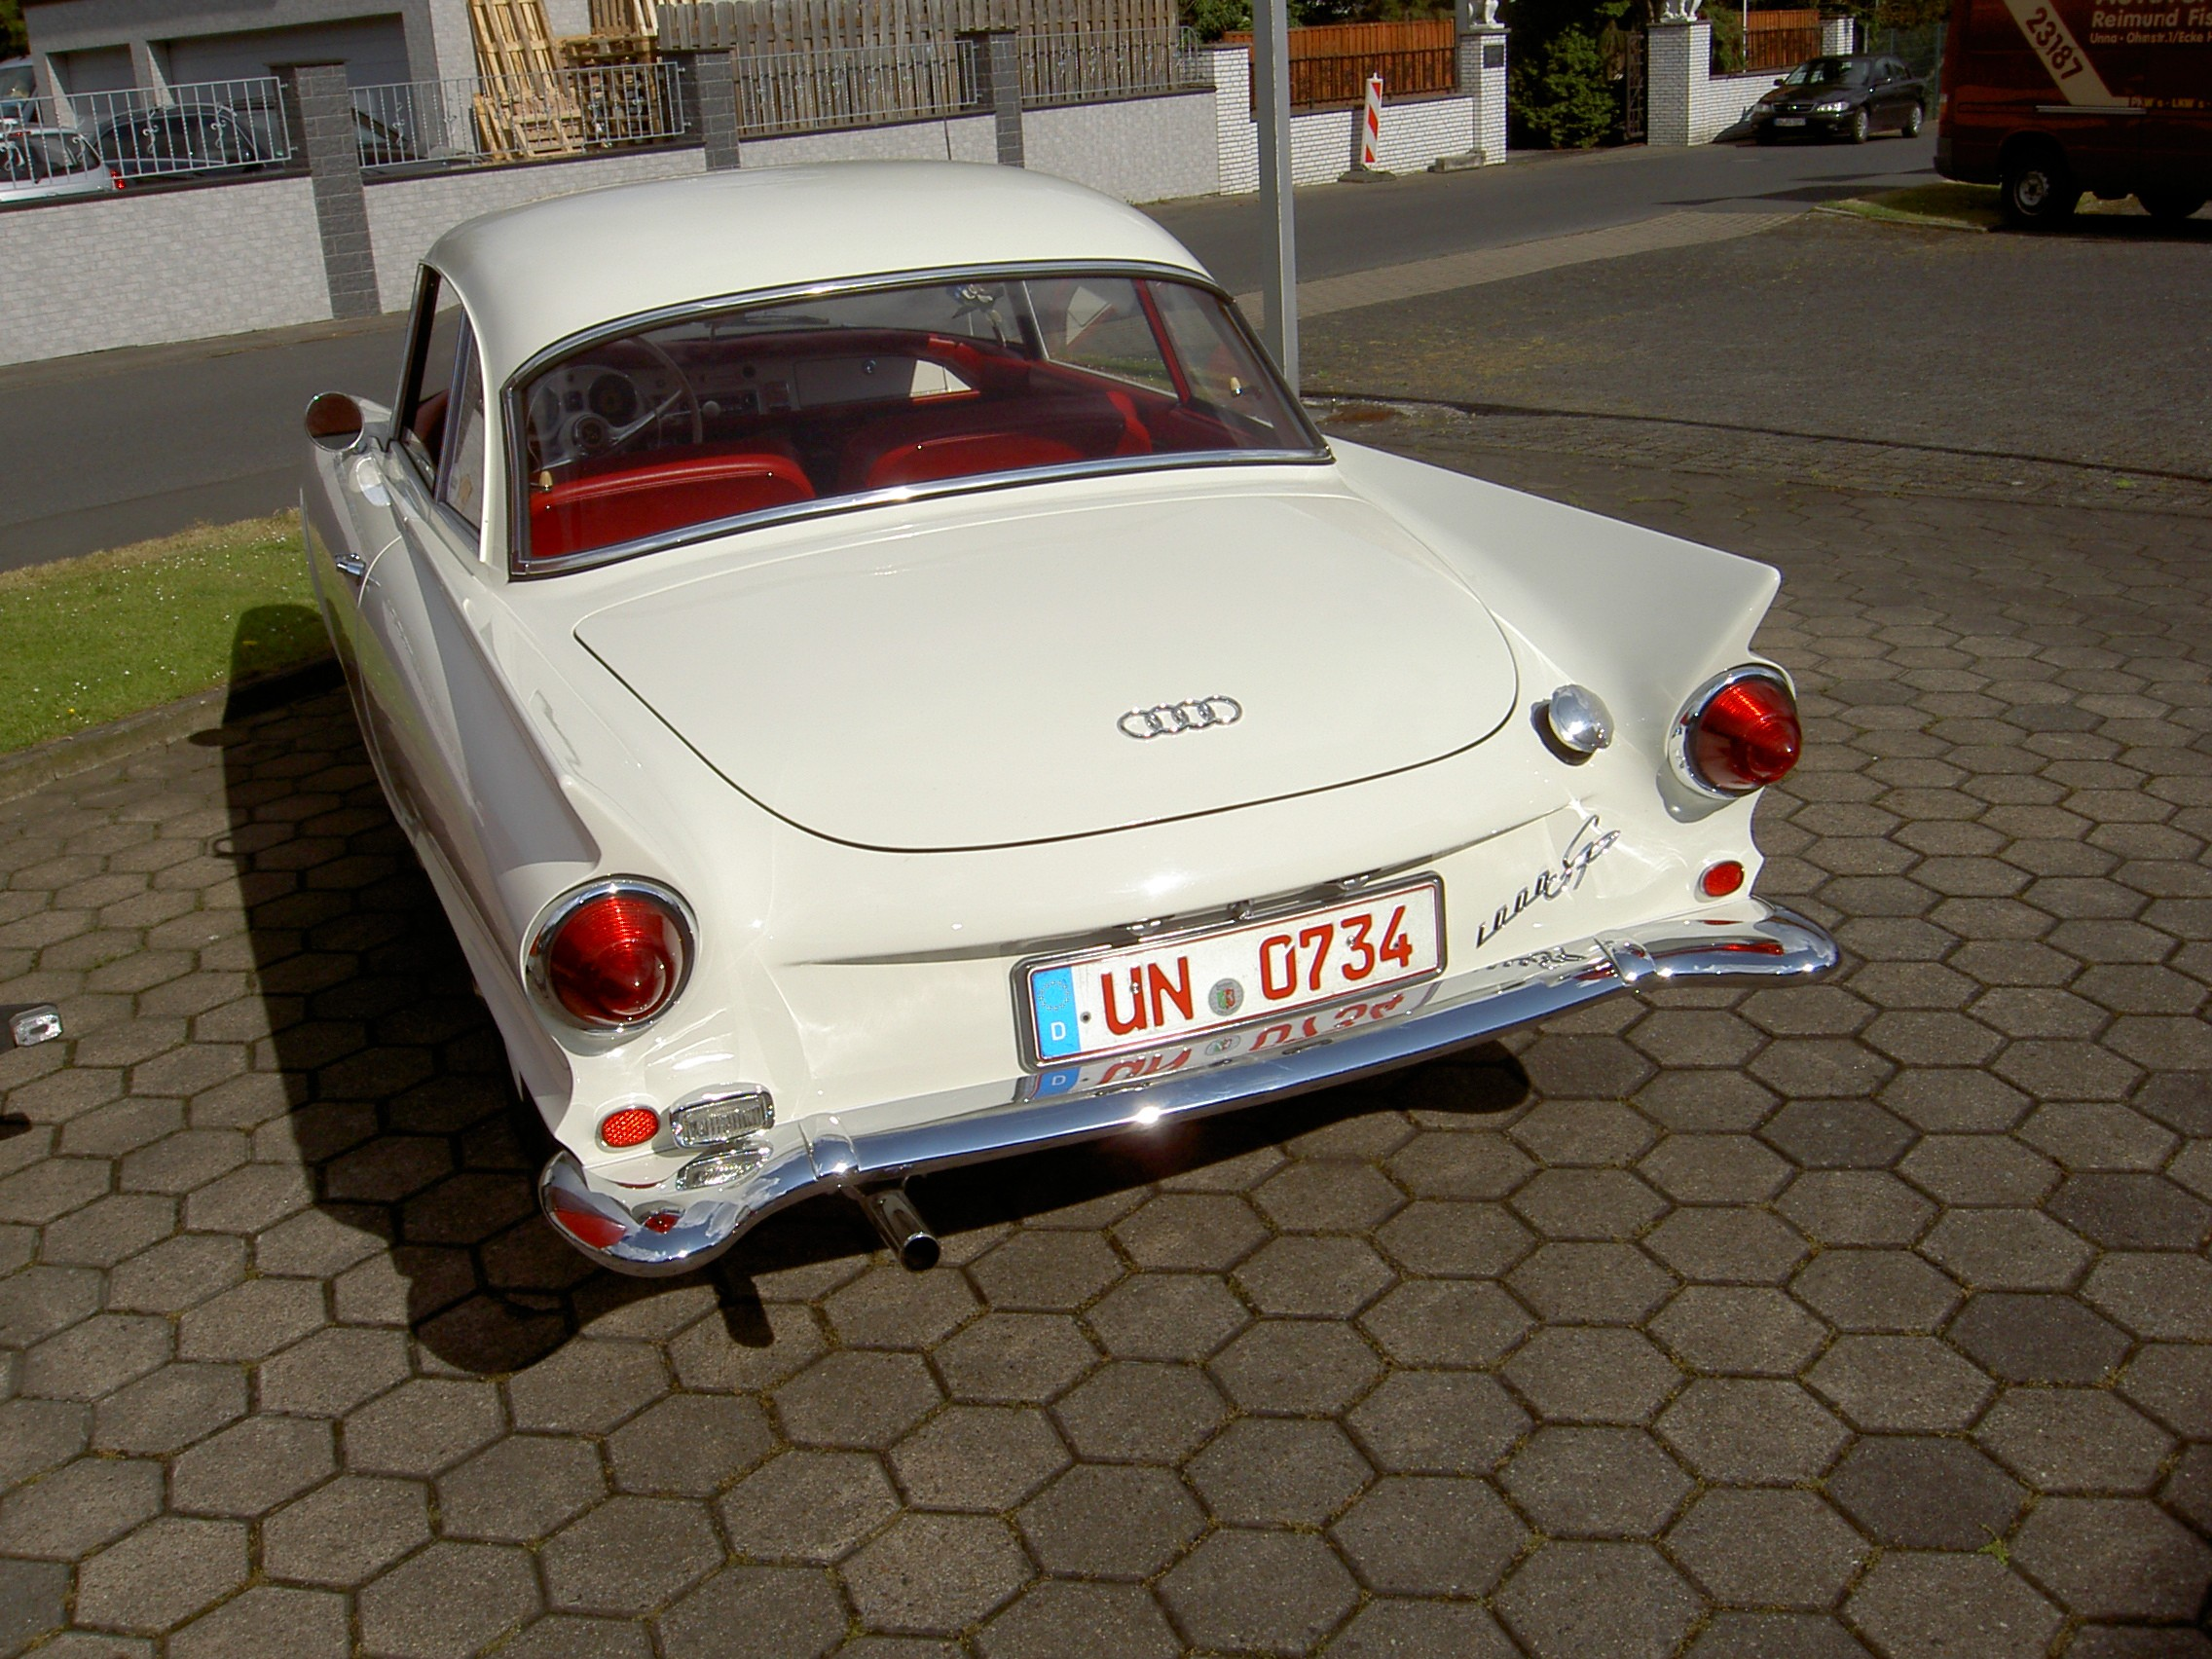 http://autoteile-anhaenger-undmehr.beepworld.de/files/audi1000sp-bj1961-heck.jpg?nocache=0.2527058439985169